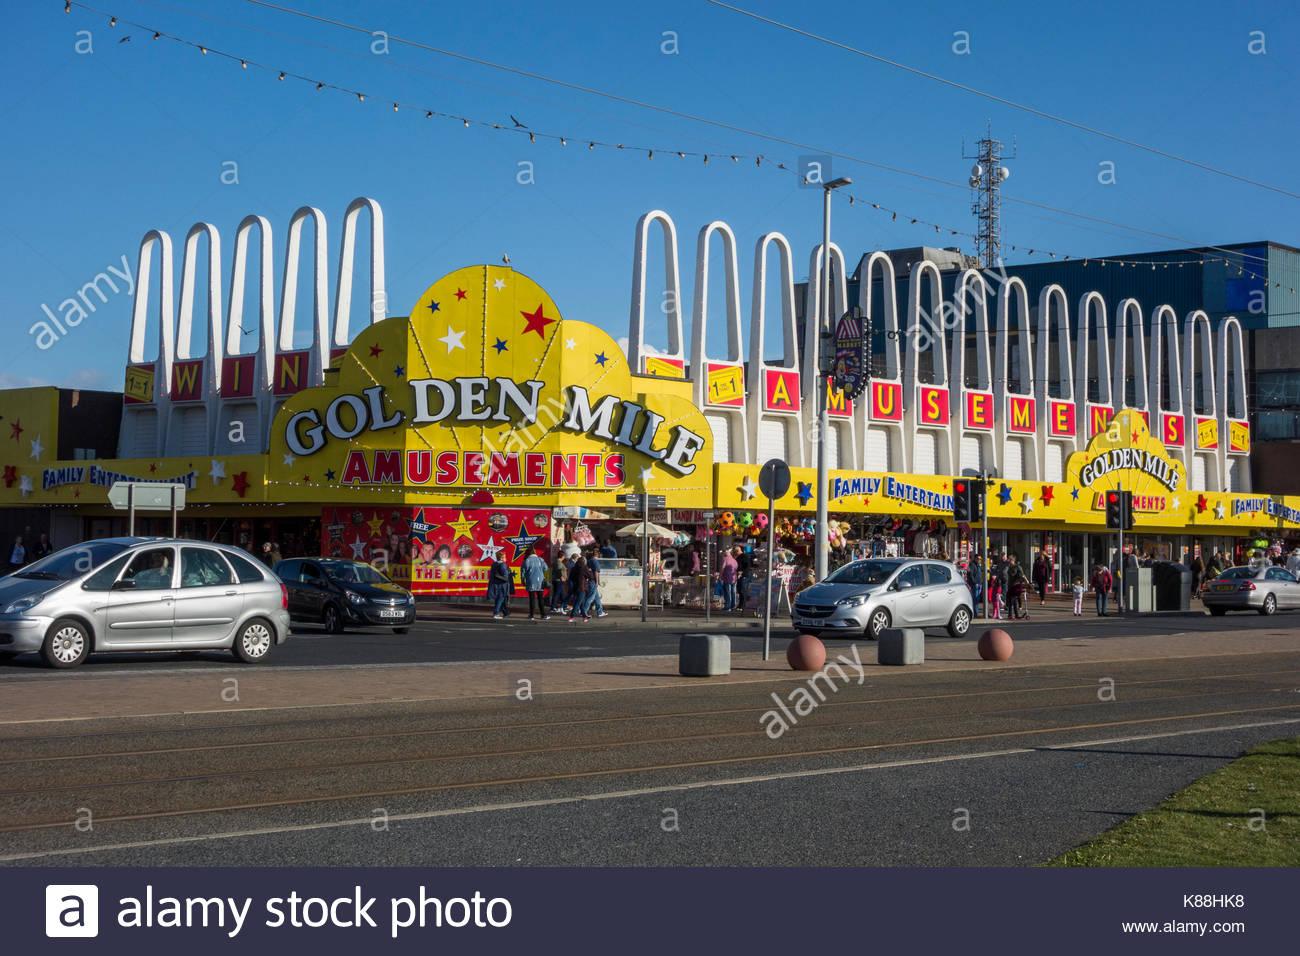 Golden Mile Amusement arcade on the sea front at Blackpool, Lancashire, England, UK - Stock Image